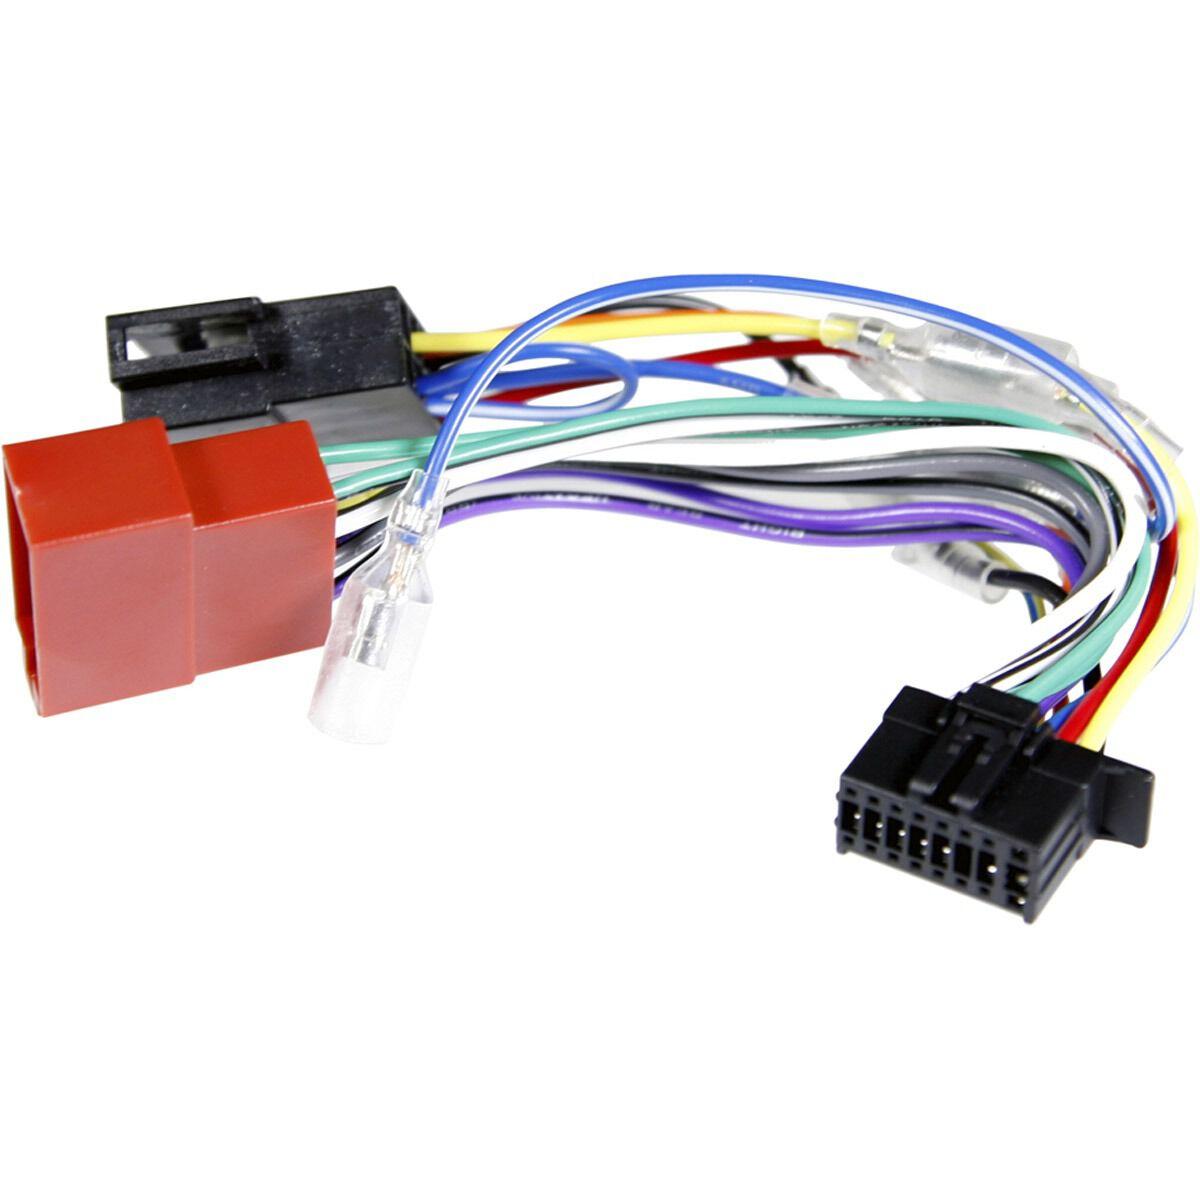 medium resolution of aerpro wiring harness suit jvc head units app8jvc5 jvc to pioneer wiring harness jvc wiring harness